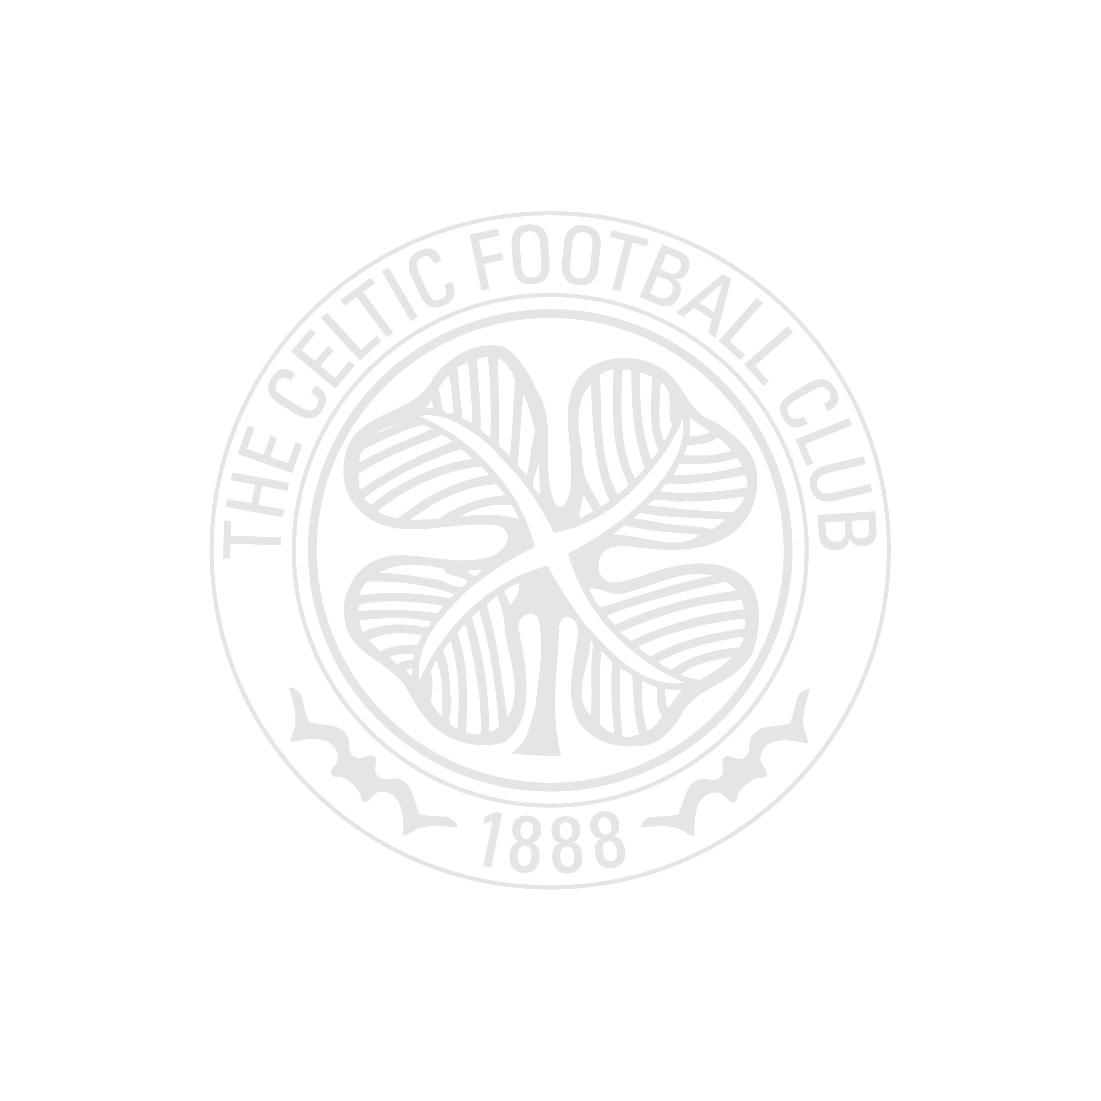 Celtic Mens Third Shirt 19/20 with Sponsor